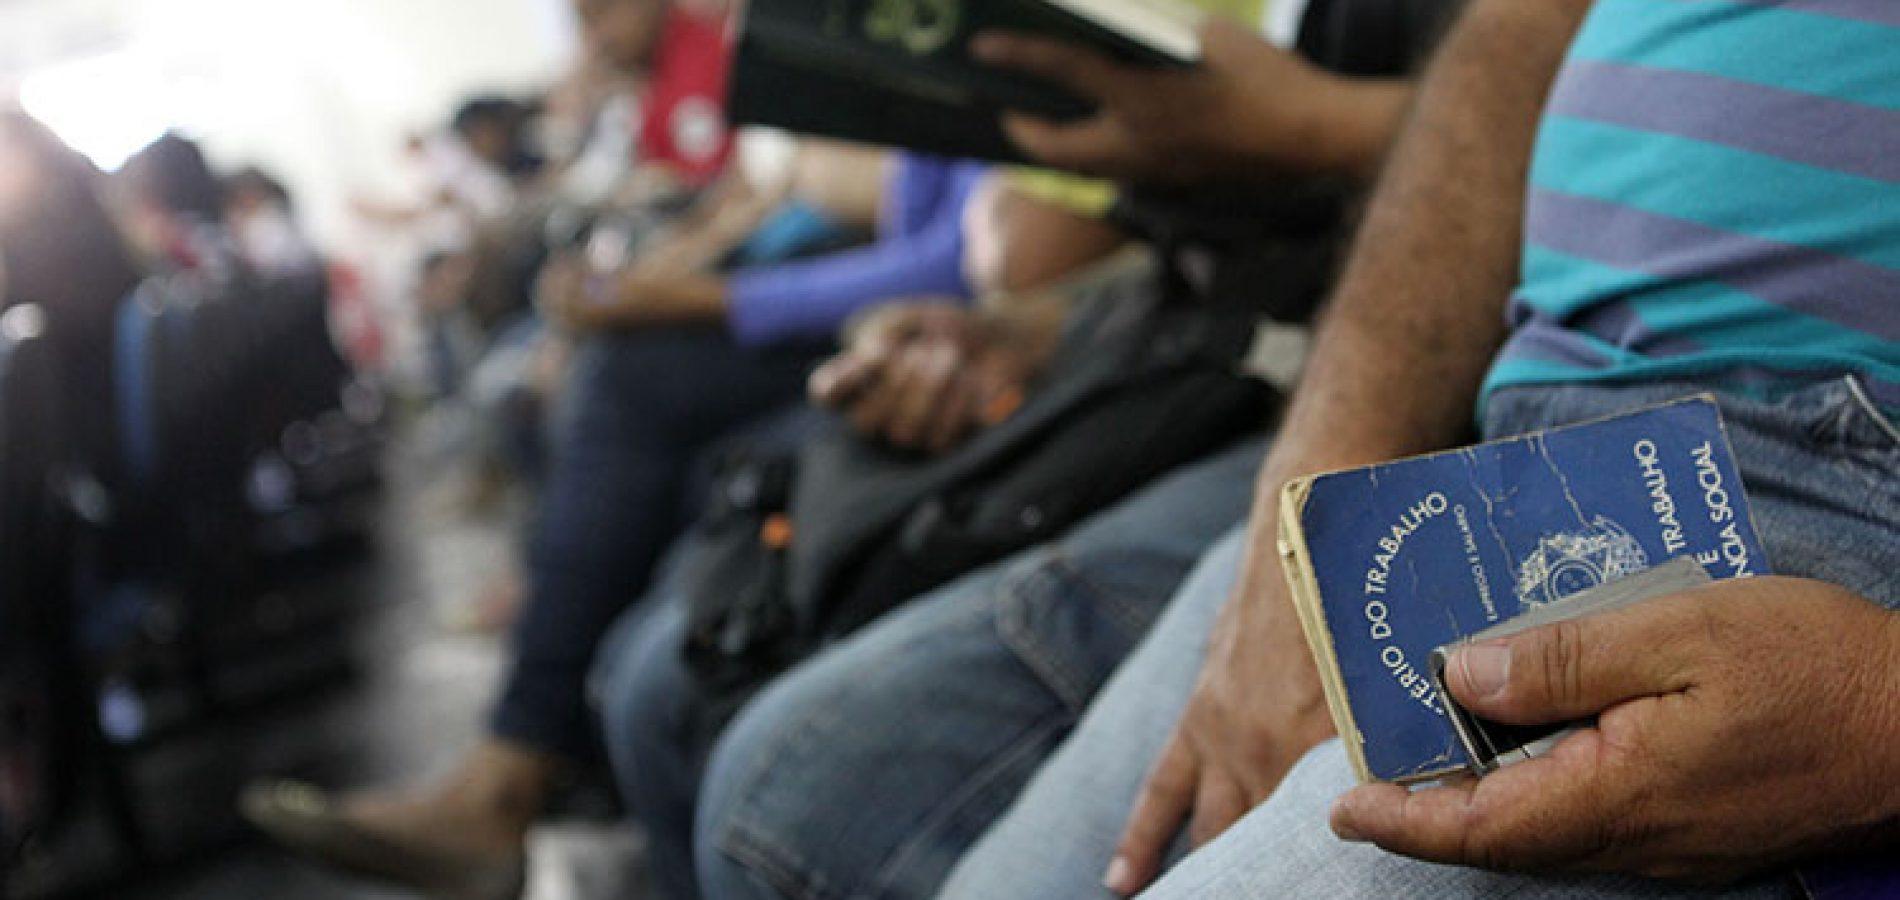 Desemprego dispara com a chegada do coronavírus e chega a 12,2%